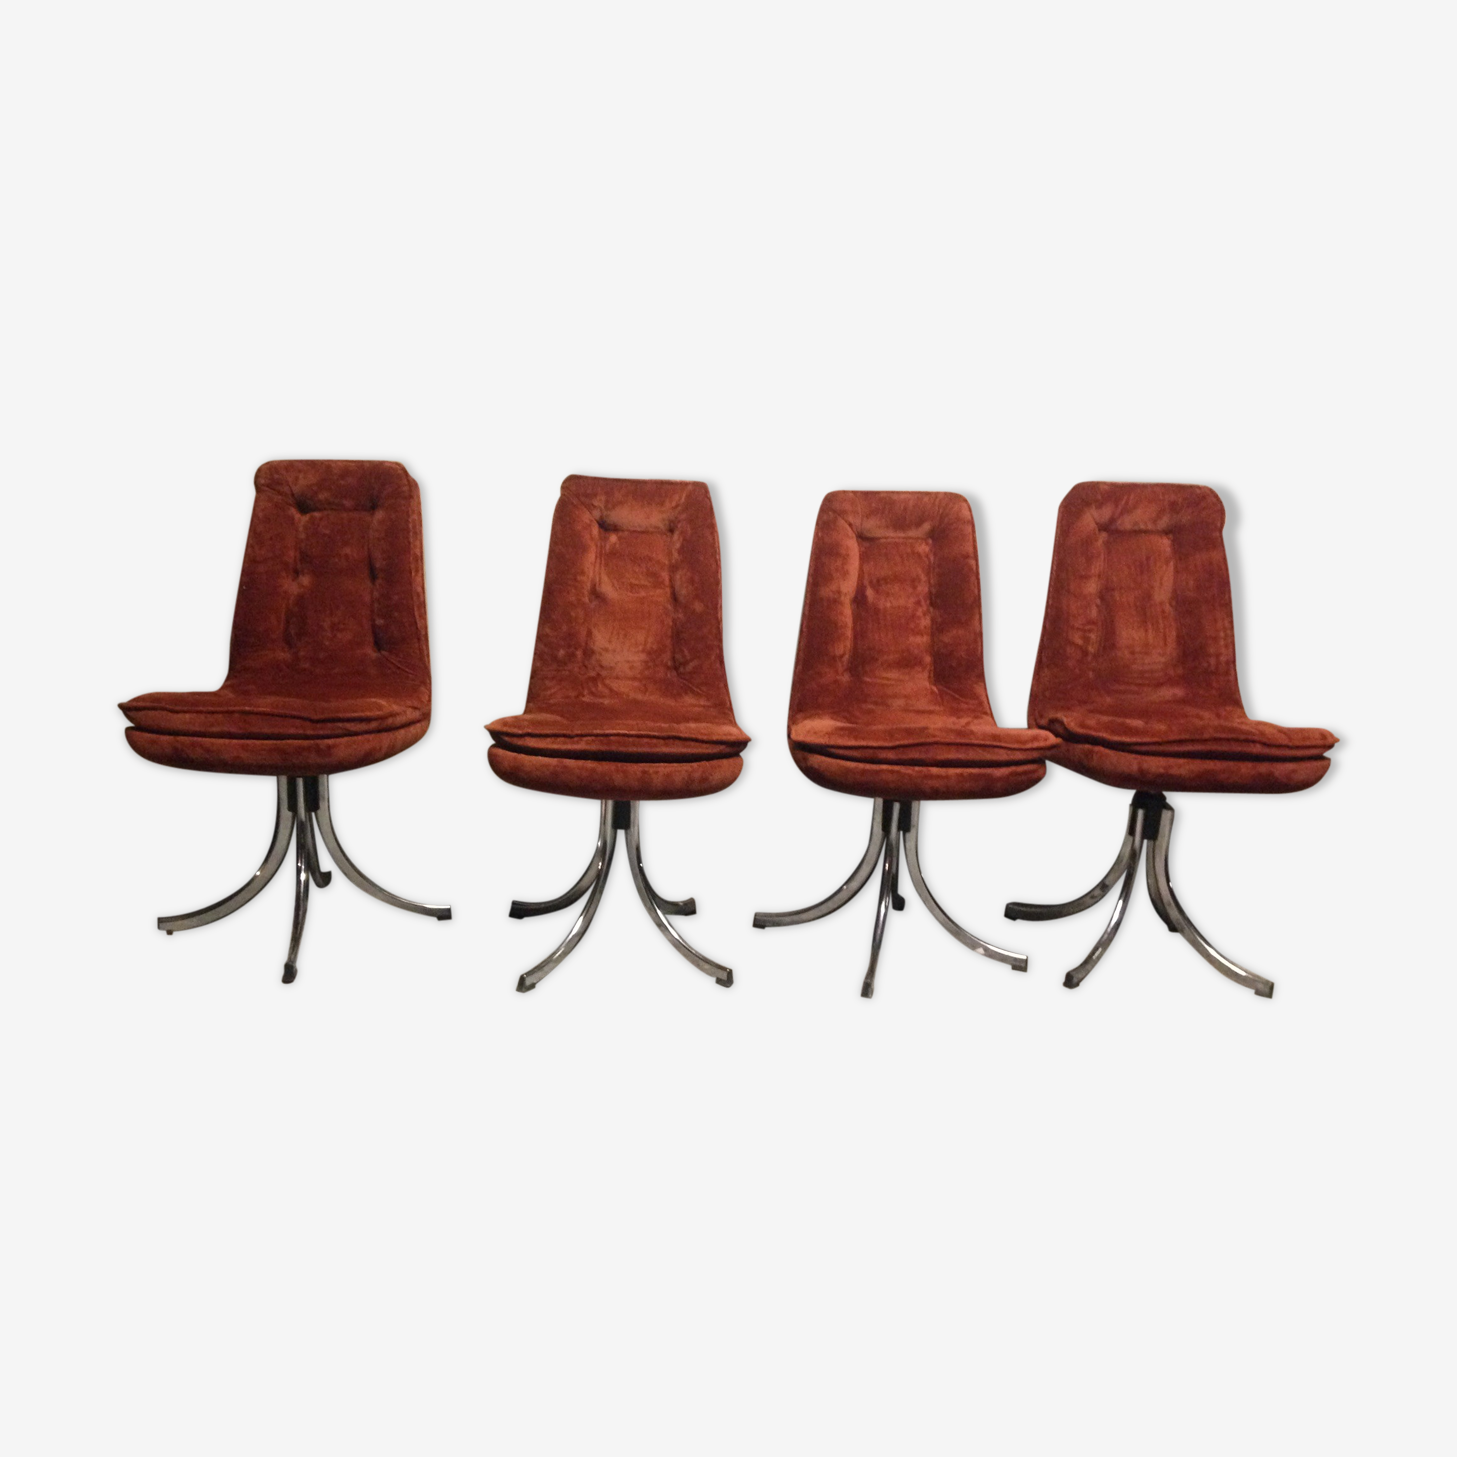 Suite de 4 chaises Gastone Rinaldi 1970 pour Rima